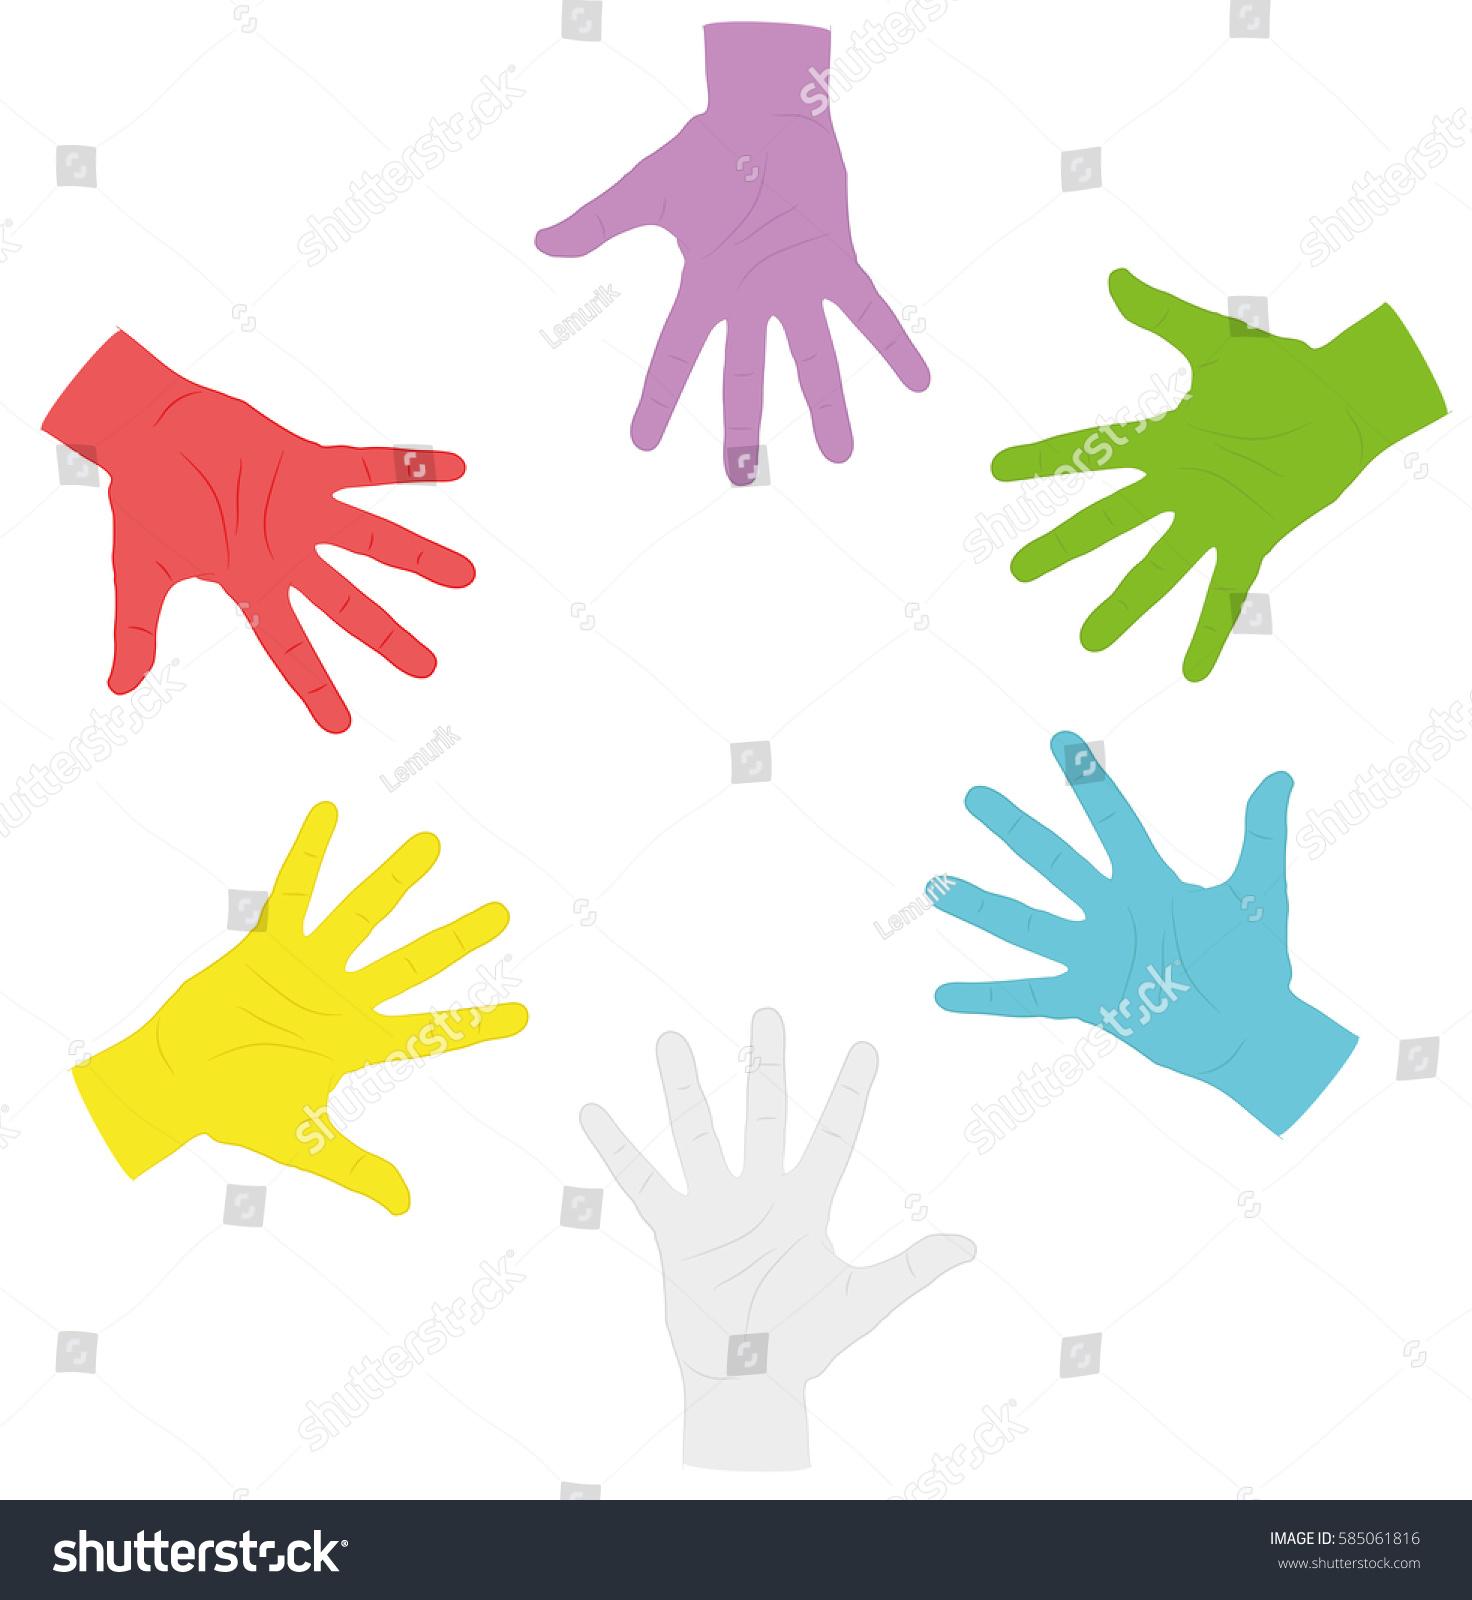 Hands different colors circle symbol autism stock vector 585061816 hands of different colors in a circle symbol of autism vector illustration biocorpaavc